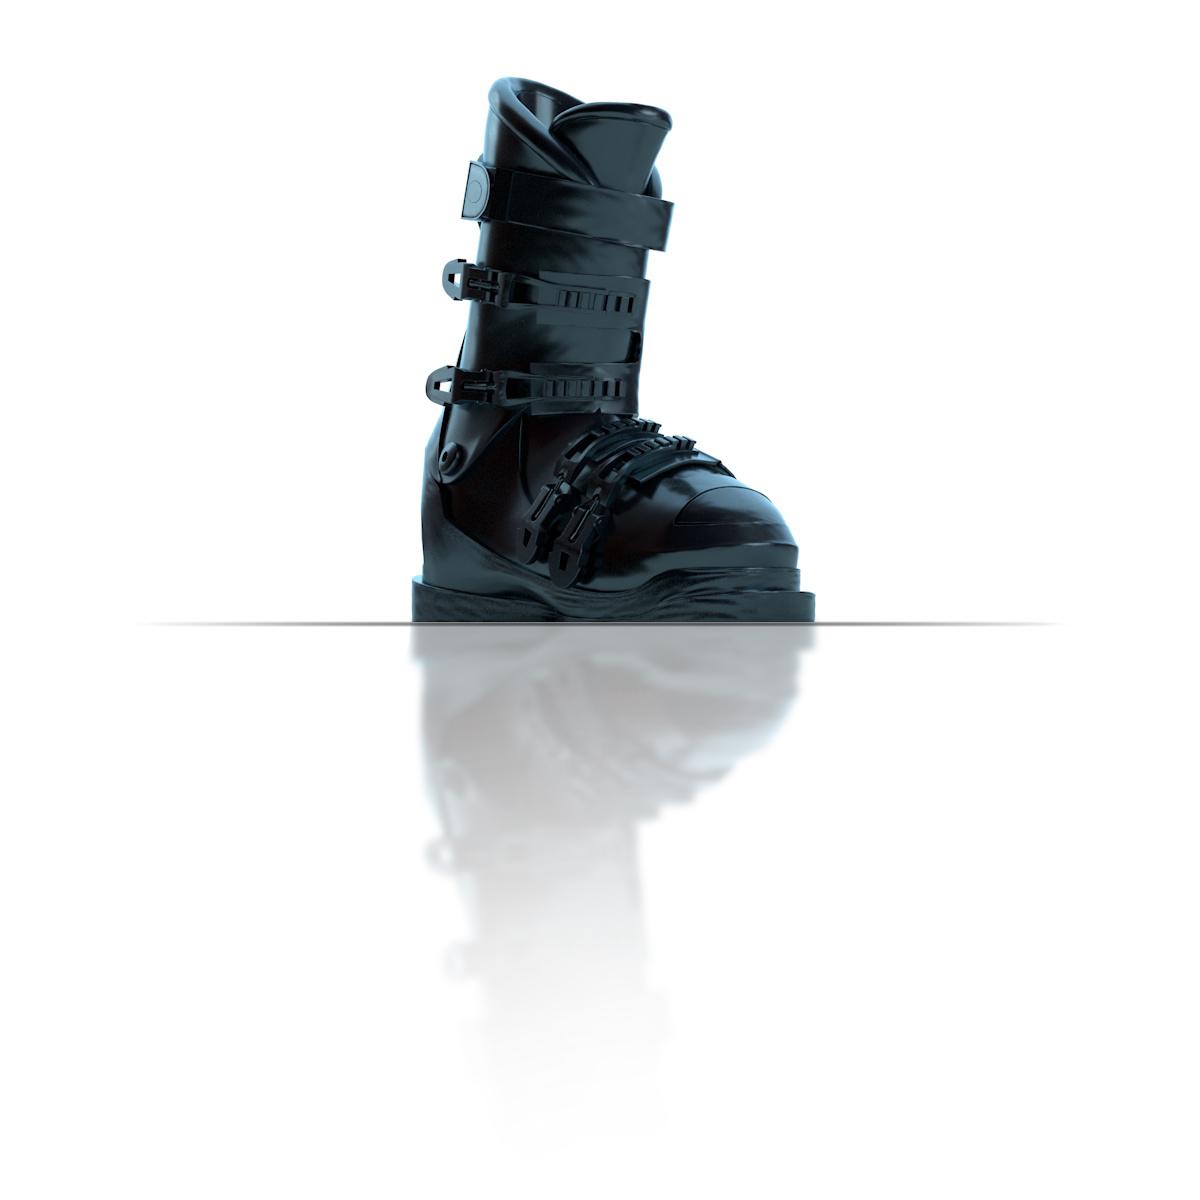 Ski boot, dark blue